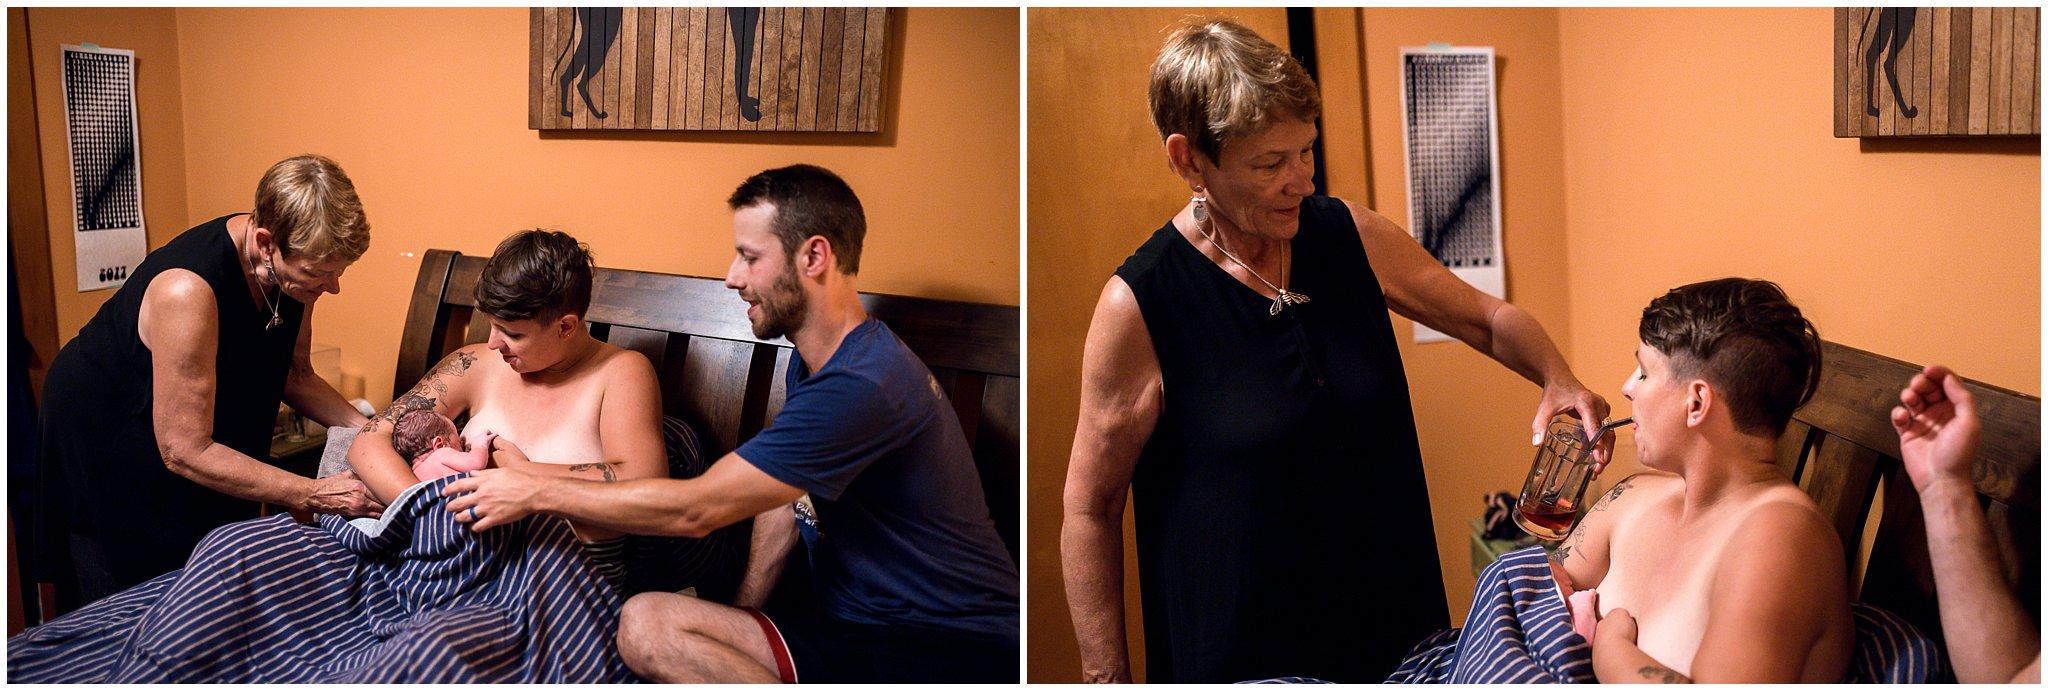 Grand Rapids home birth photographer - Annica Quakenbush - first latch midwife Yolanda Visser